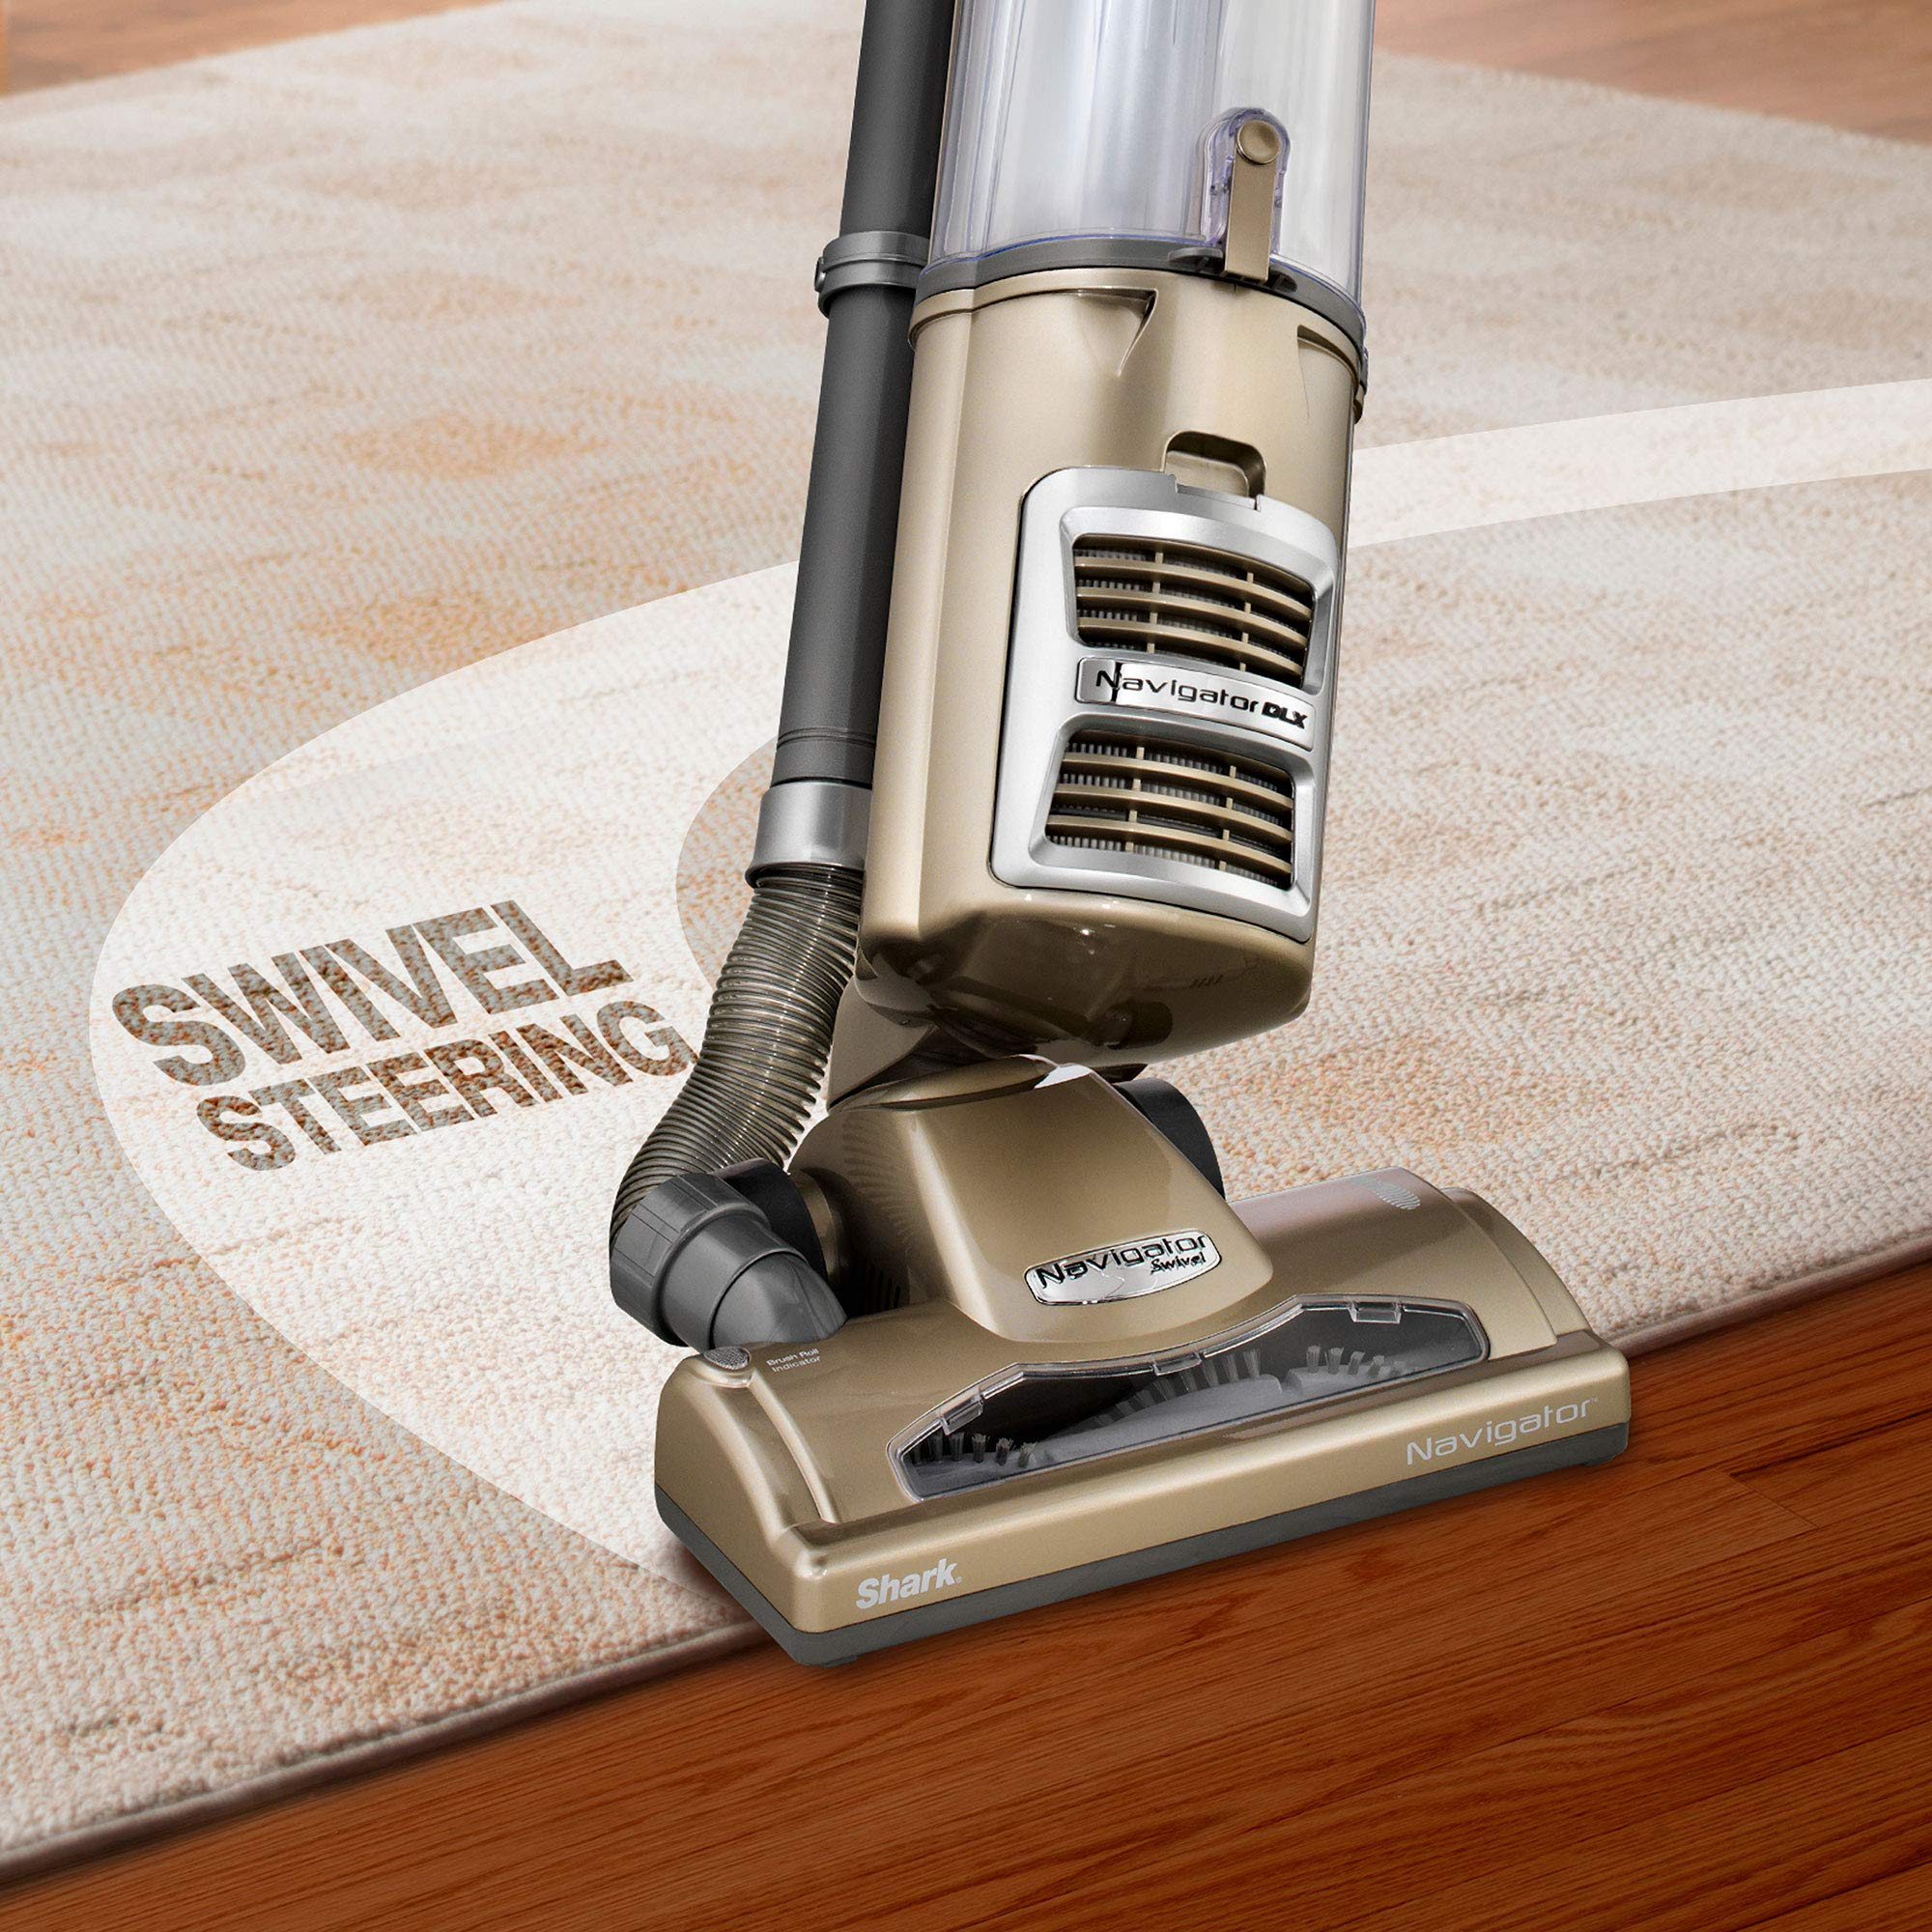 Shark NV70 Navigator Professional Upright Vacuum, Gold by Shark (Image #7)